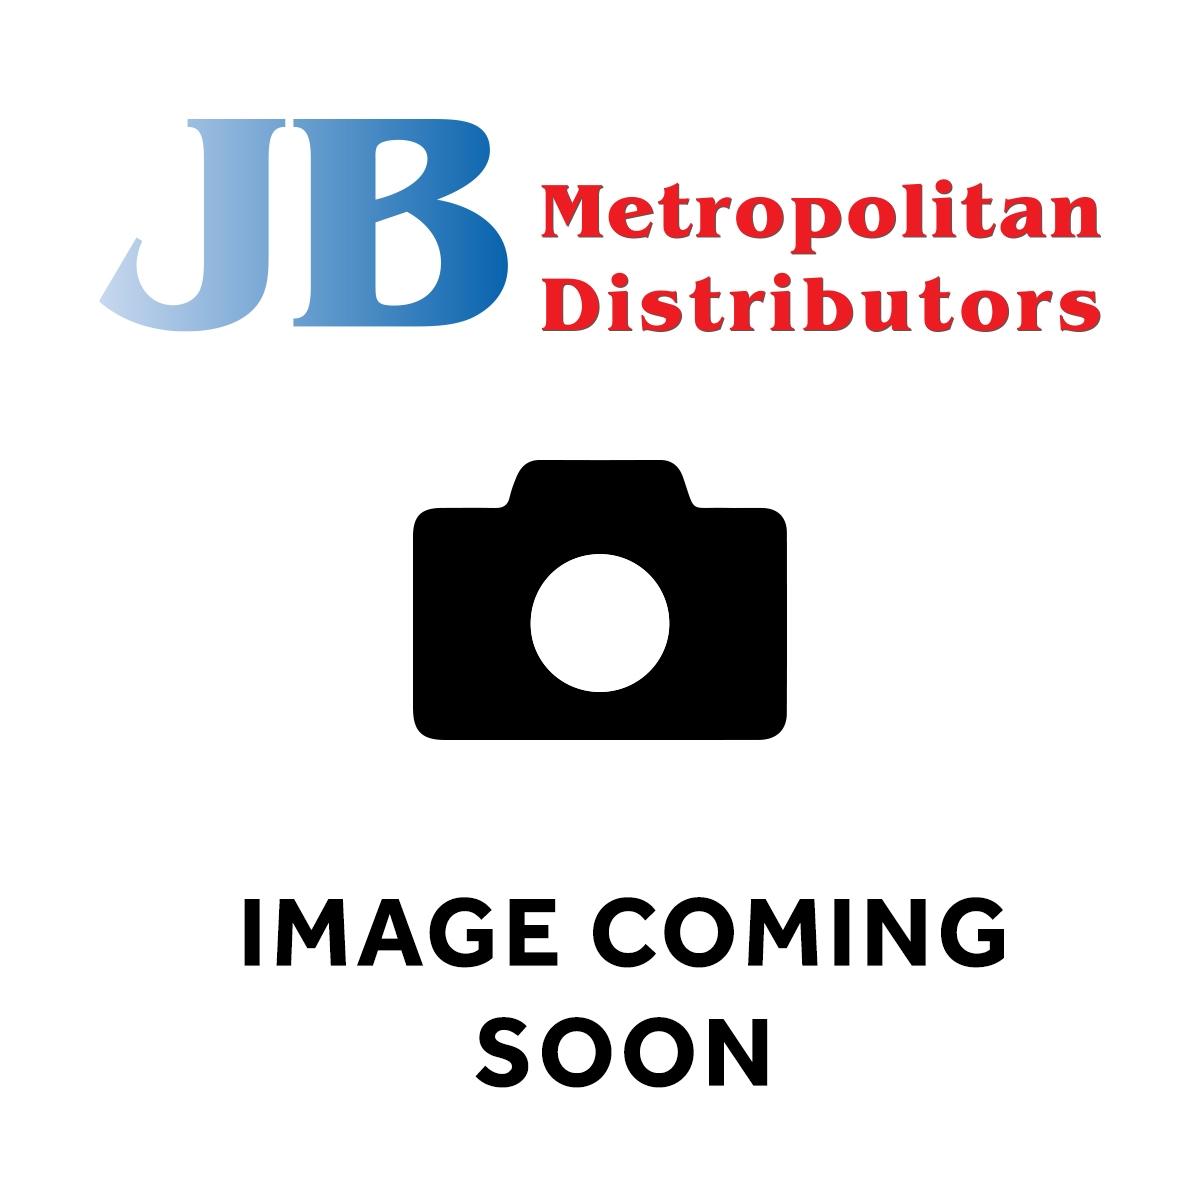 175G MASTERFOODS WHOLEGRAIN MUSTARD